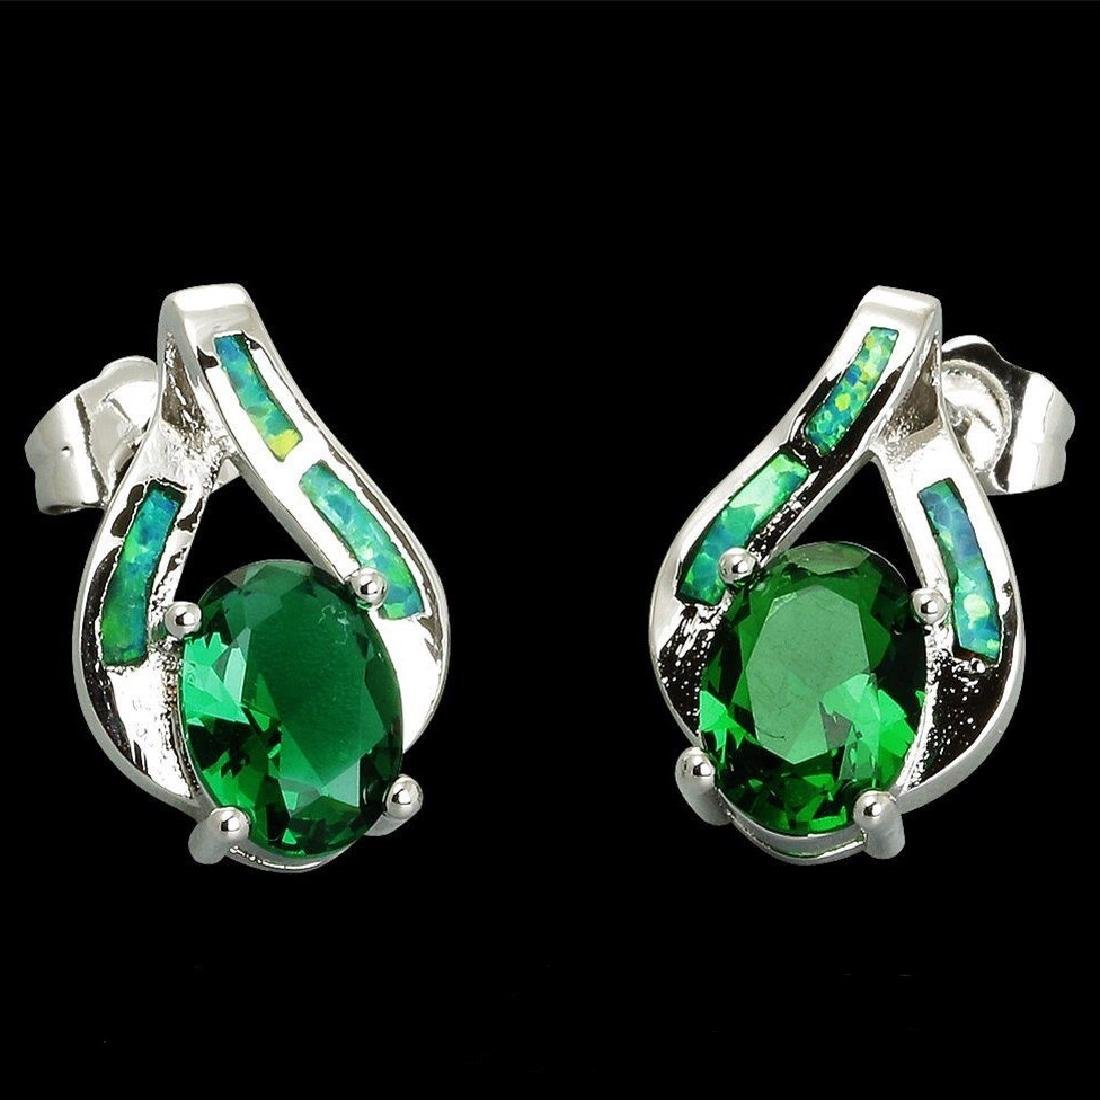 Natural Green Topaz & Opal Earrings